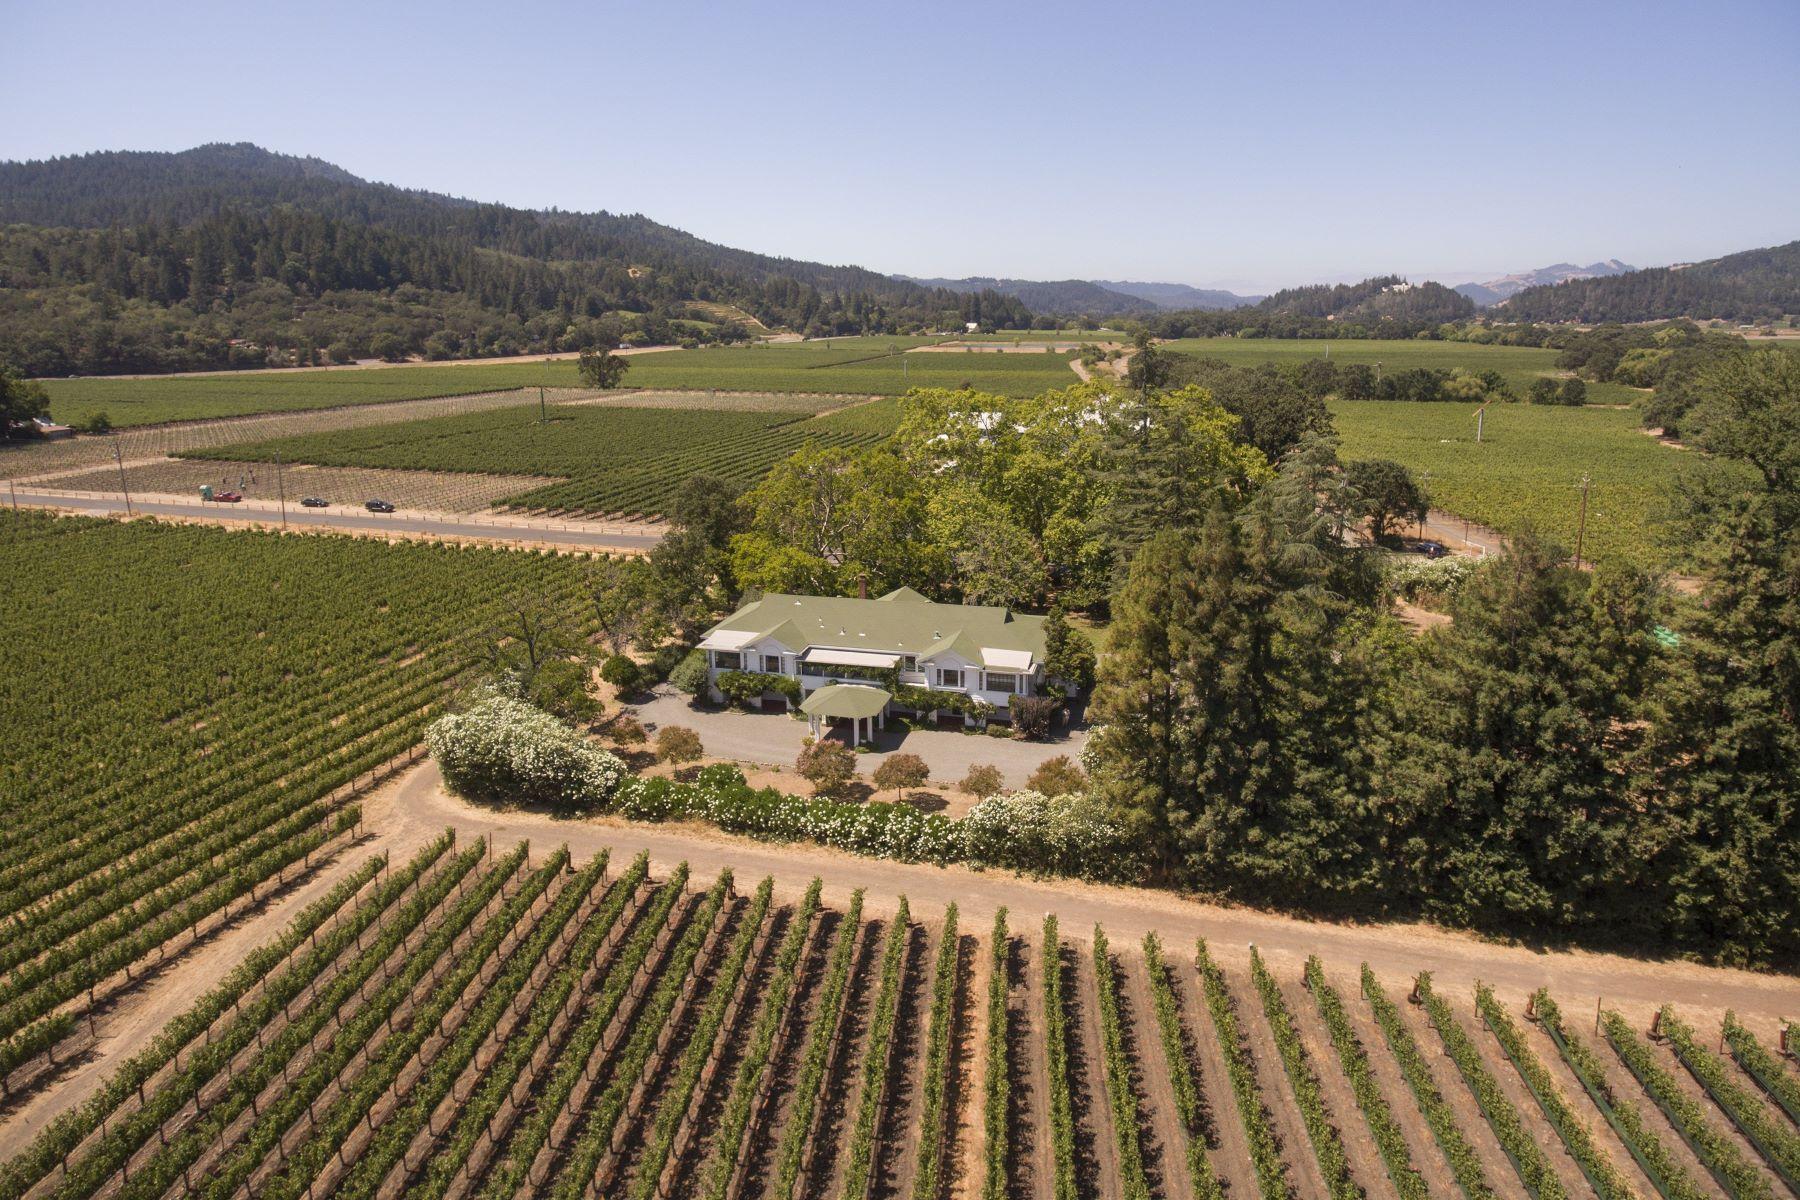 Single Family Home for Sale at Larkmead Inn in the Vineyards 1103 Larkmead Lane Calistoga, California 94515 United States